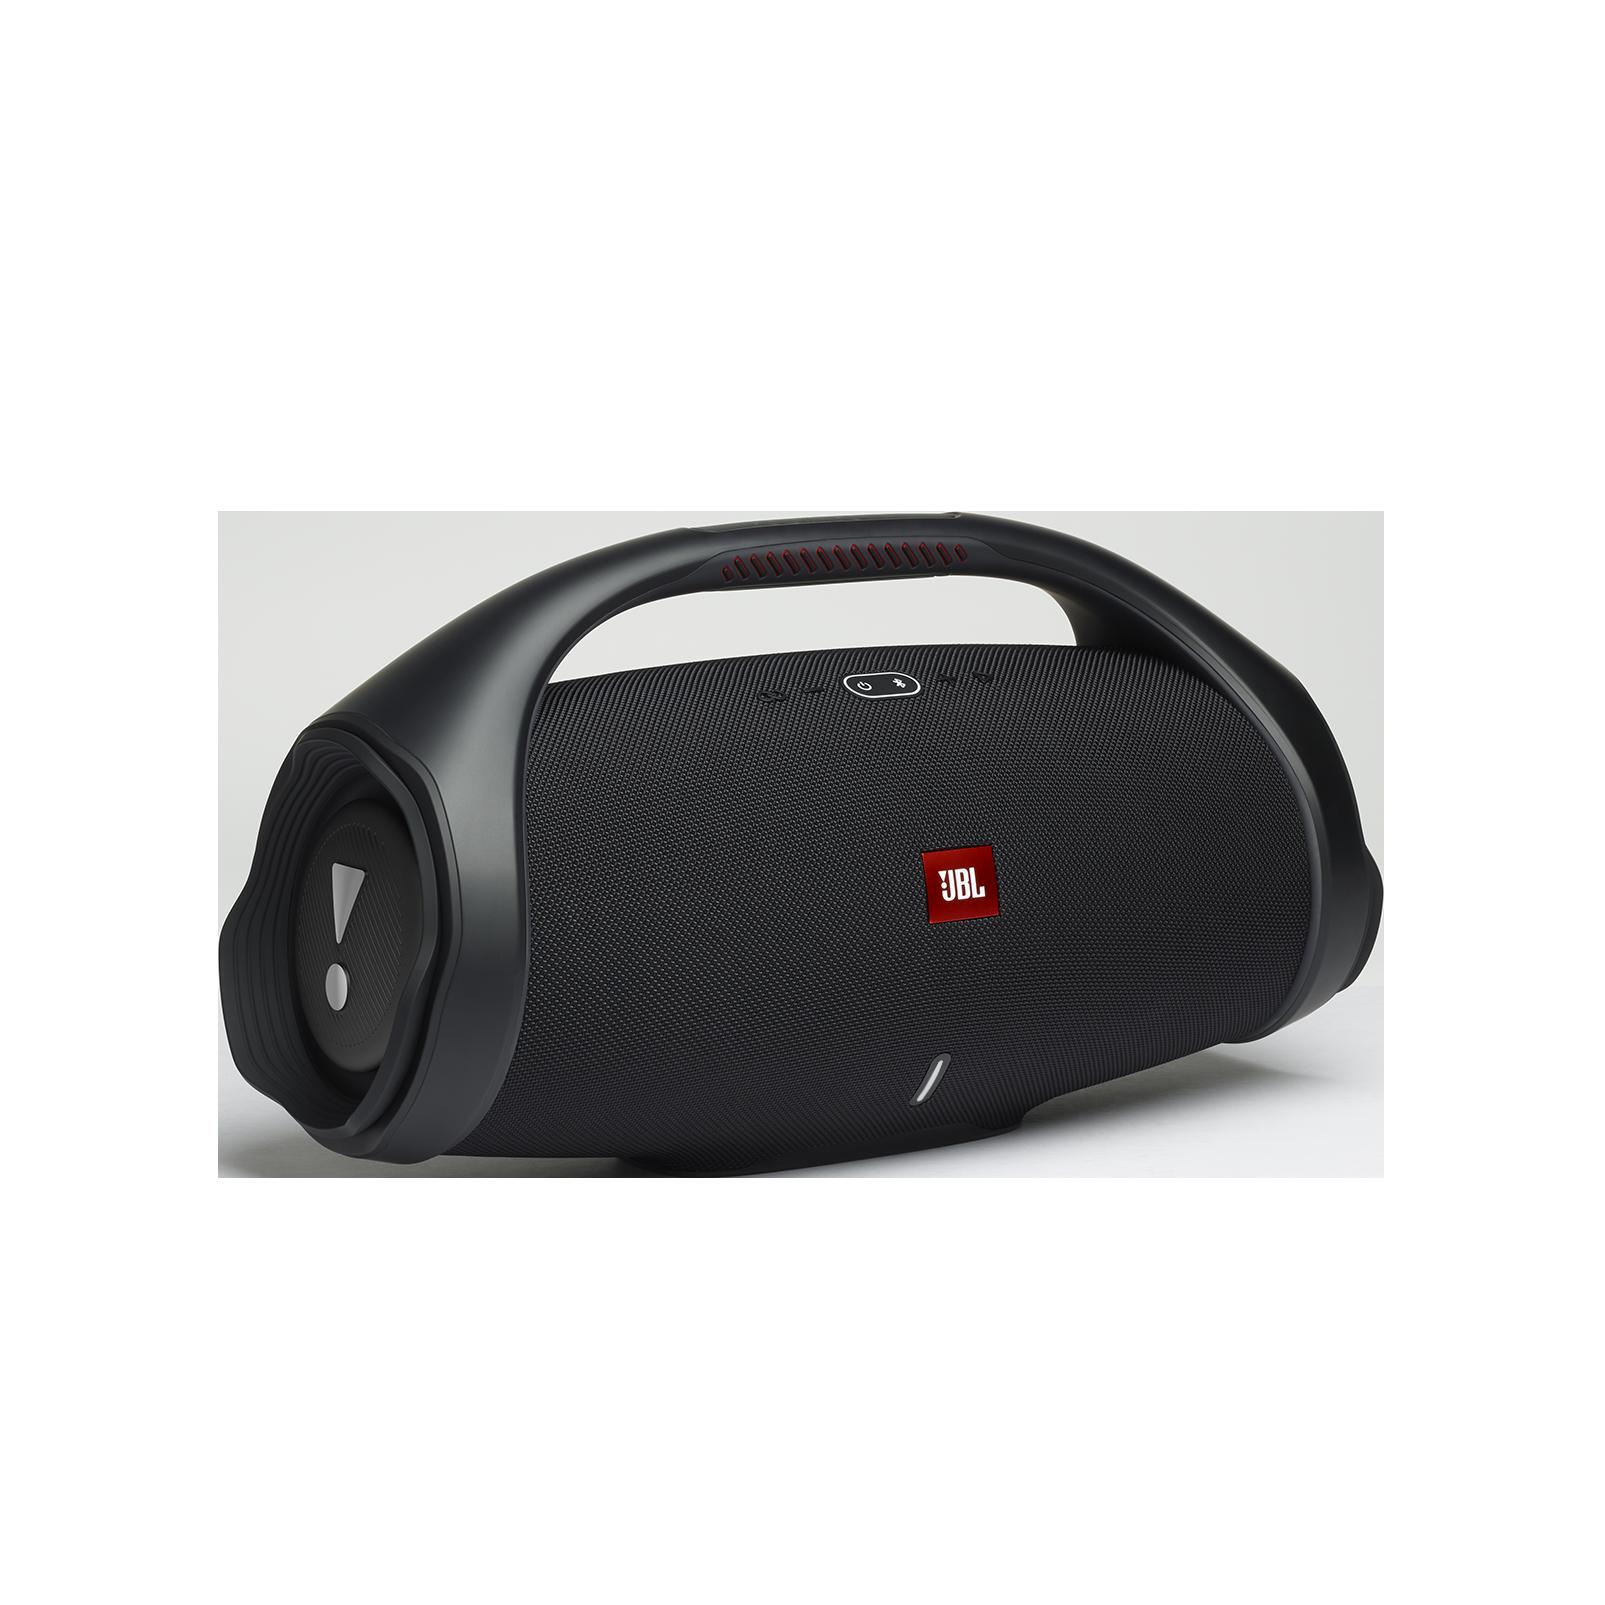 JBL Boombox 2 - Black - Portable Bluetooth Speaker - Hero